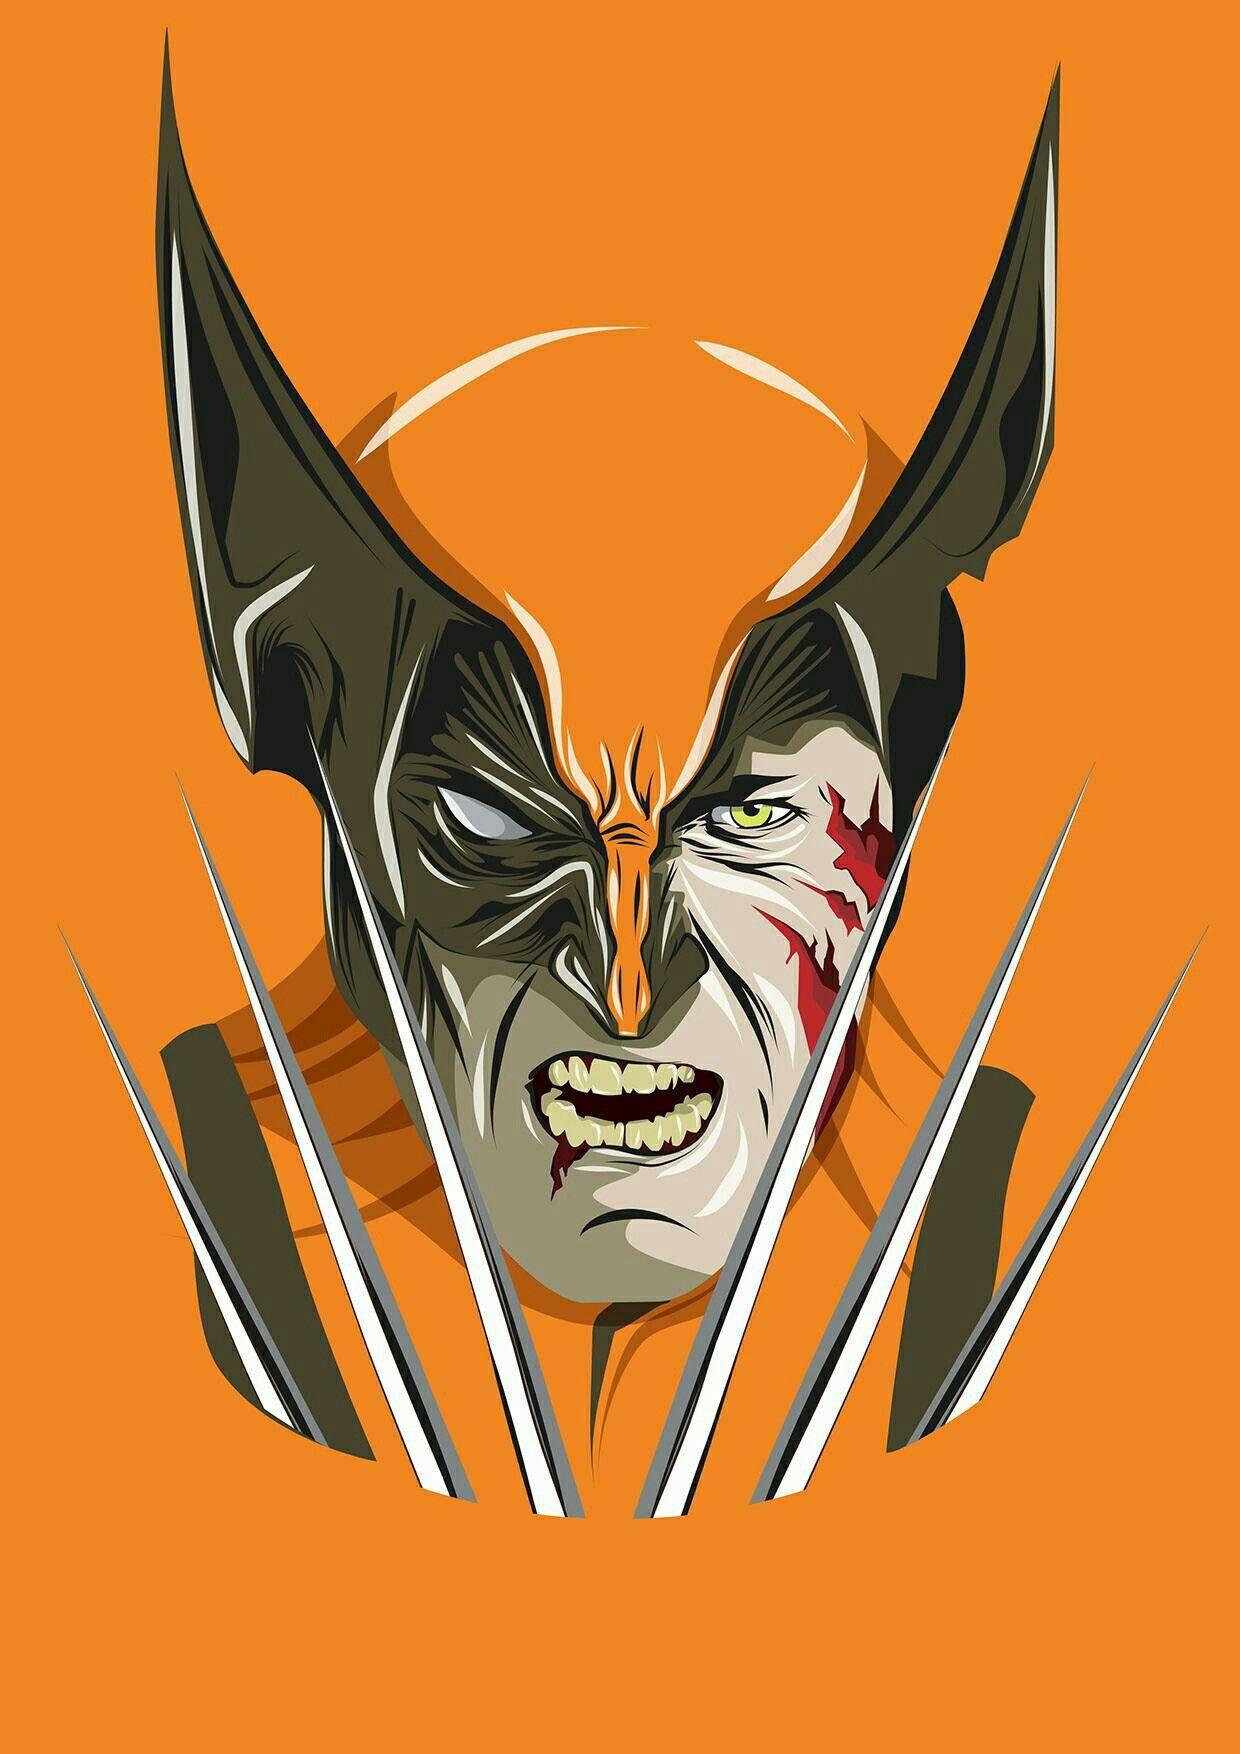 Pin By Melissa Rivera On Marvel Wolverine Logan Art Best Iphone Wallpapers Hero Wallpaper